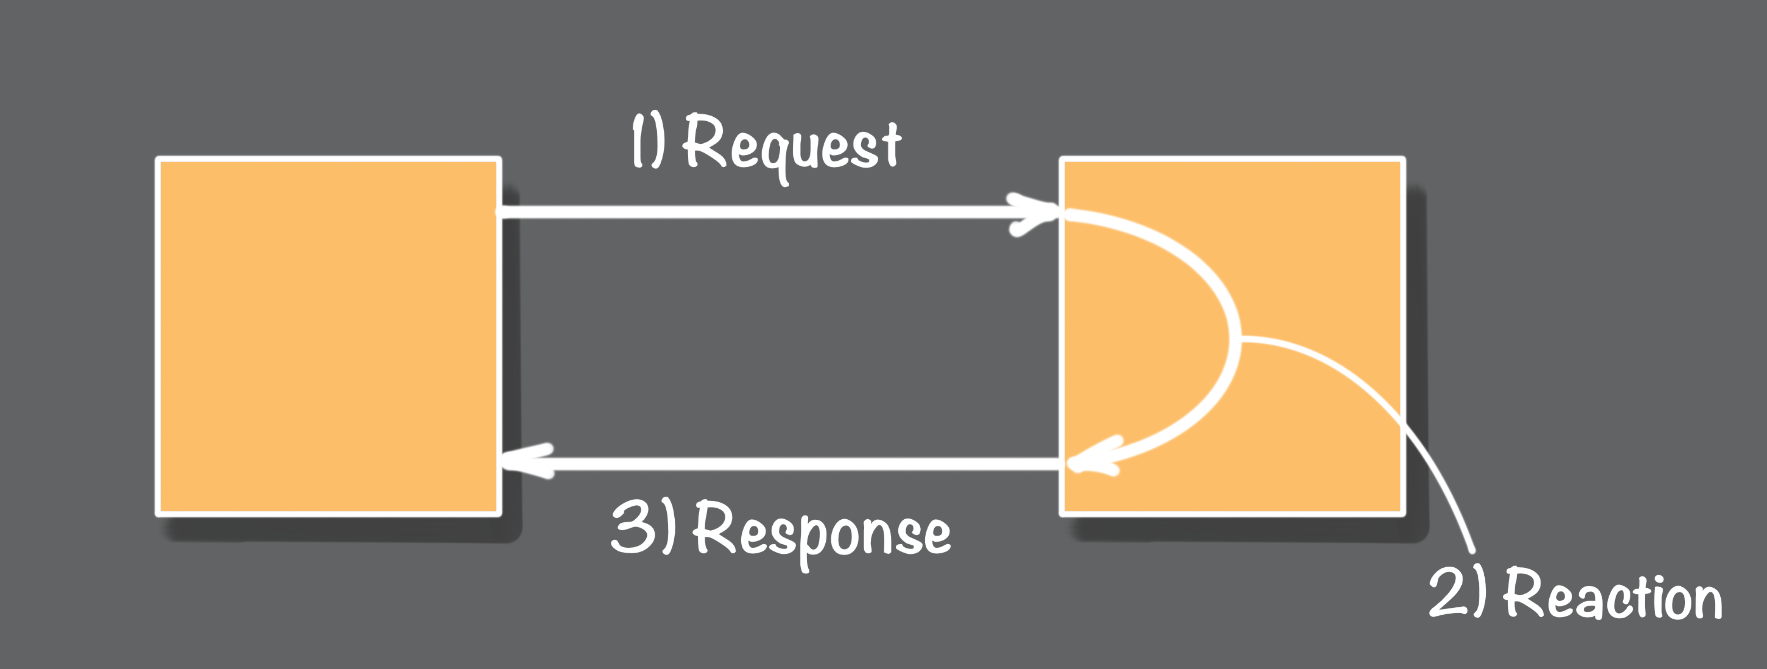 Figure 6 - Synchronous or Asynchronous?